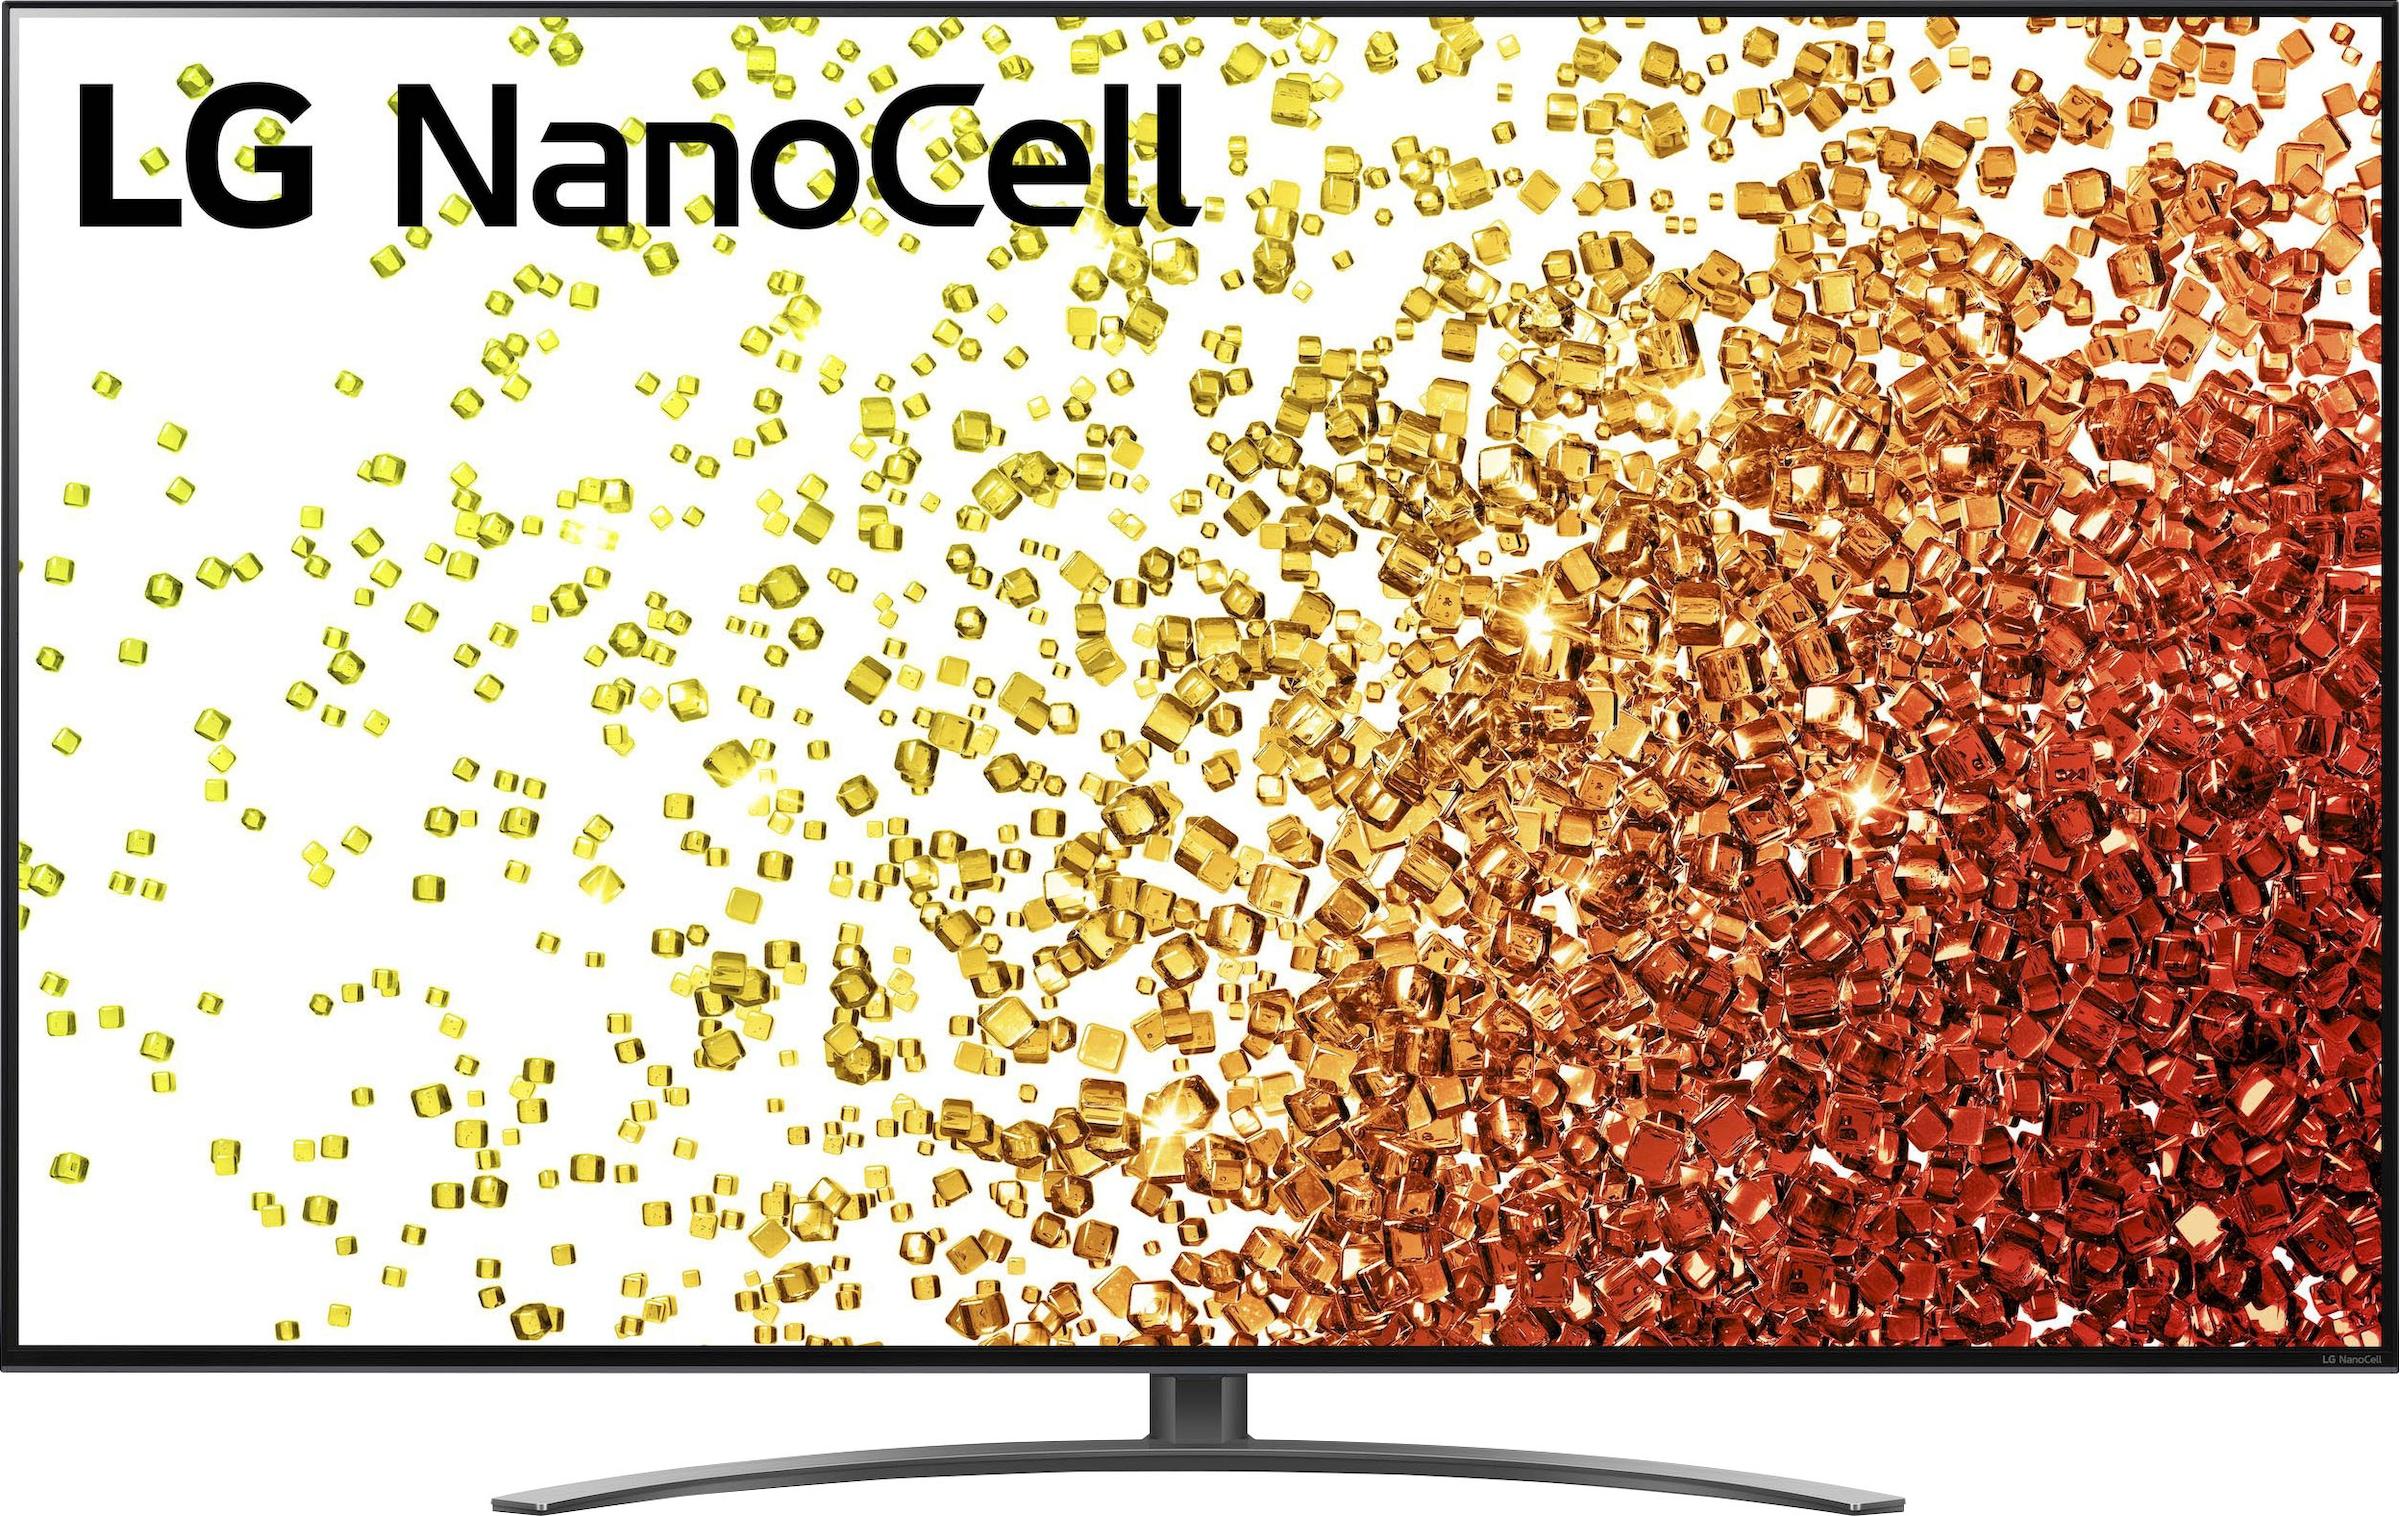 LG LCD-LED Fernseher 86NANO919PA , 217 cm 86 , 4K Ultra HD, Smart-TV, bis zu 120Hz -Full Array Dimming Pro-α7 Gen4 4K AI-Prozessor-Sprachassistenten-HDMI 2.1